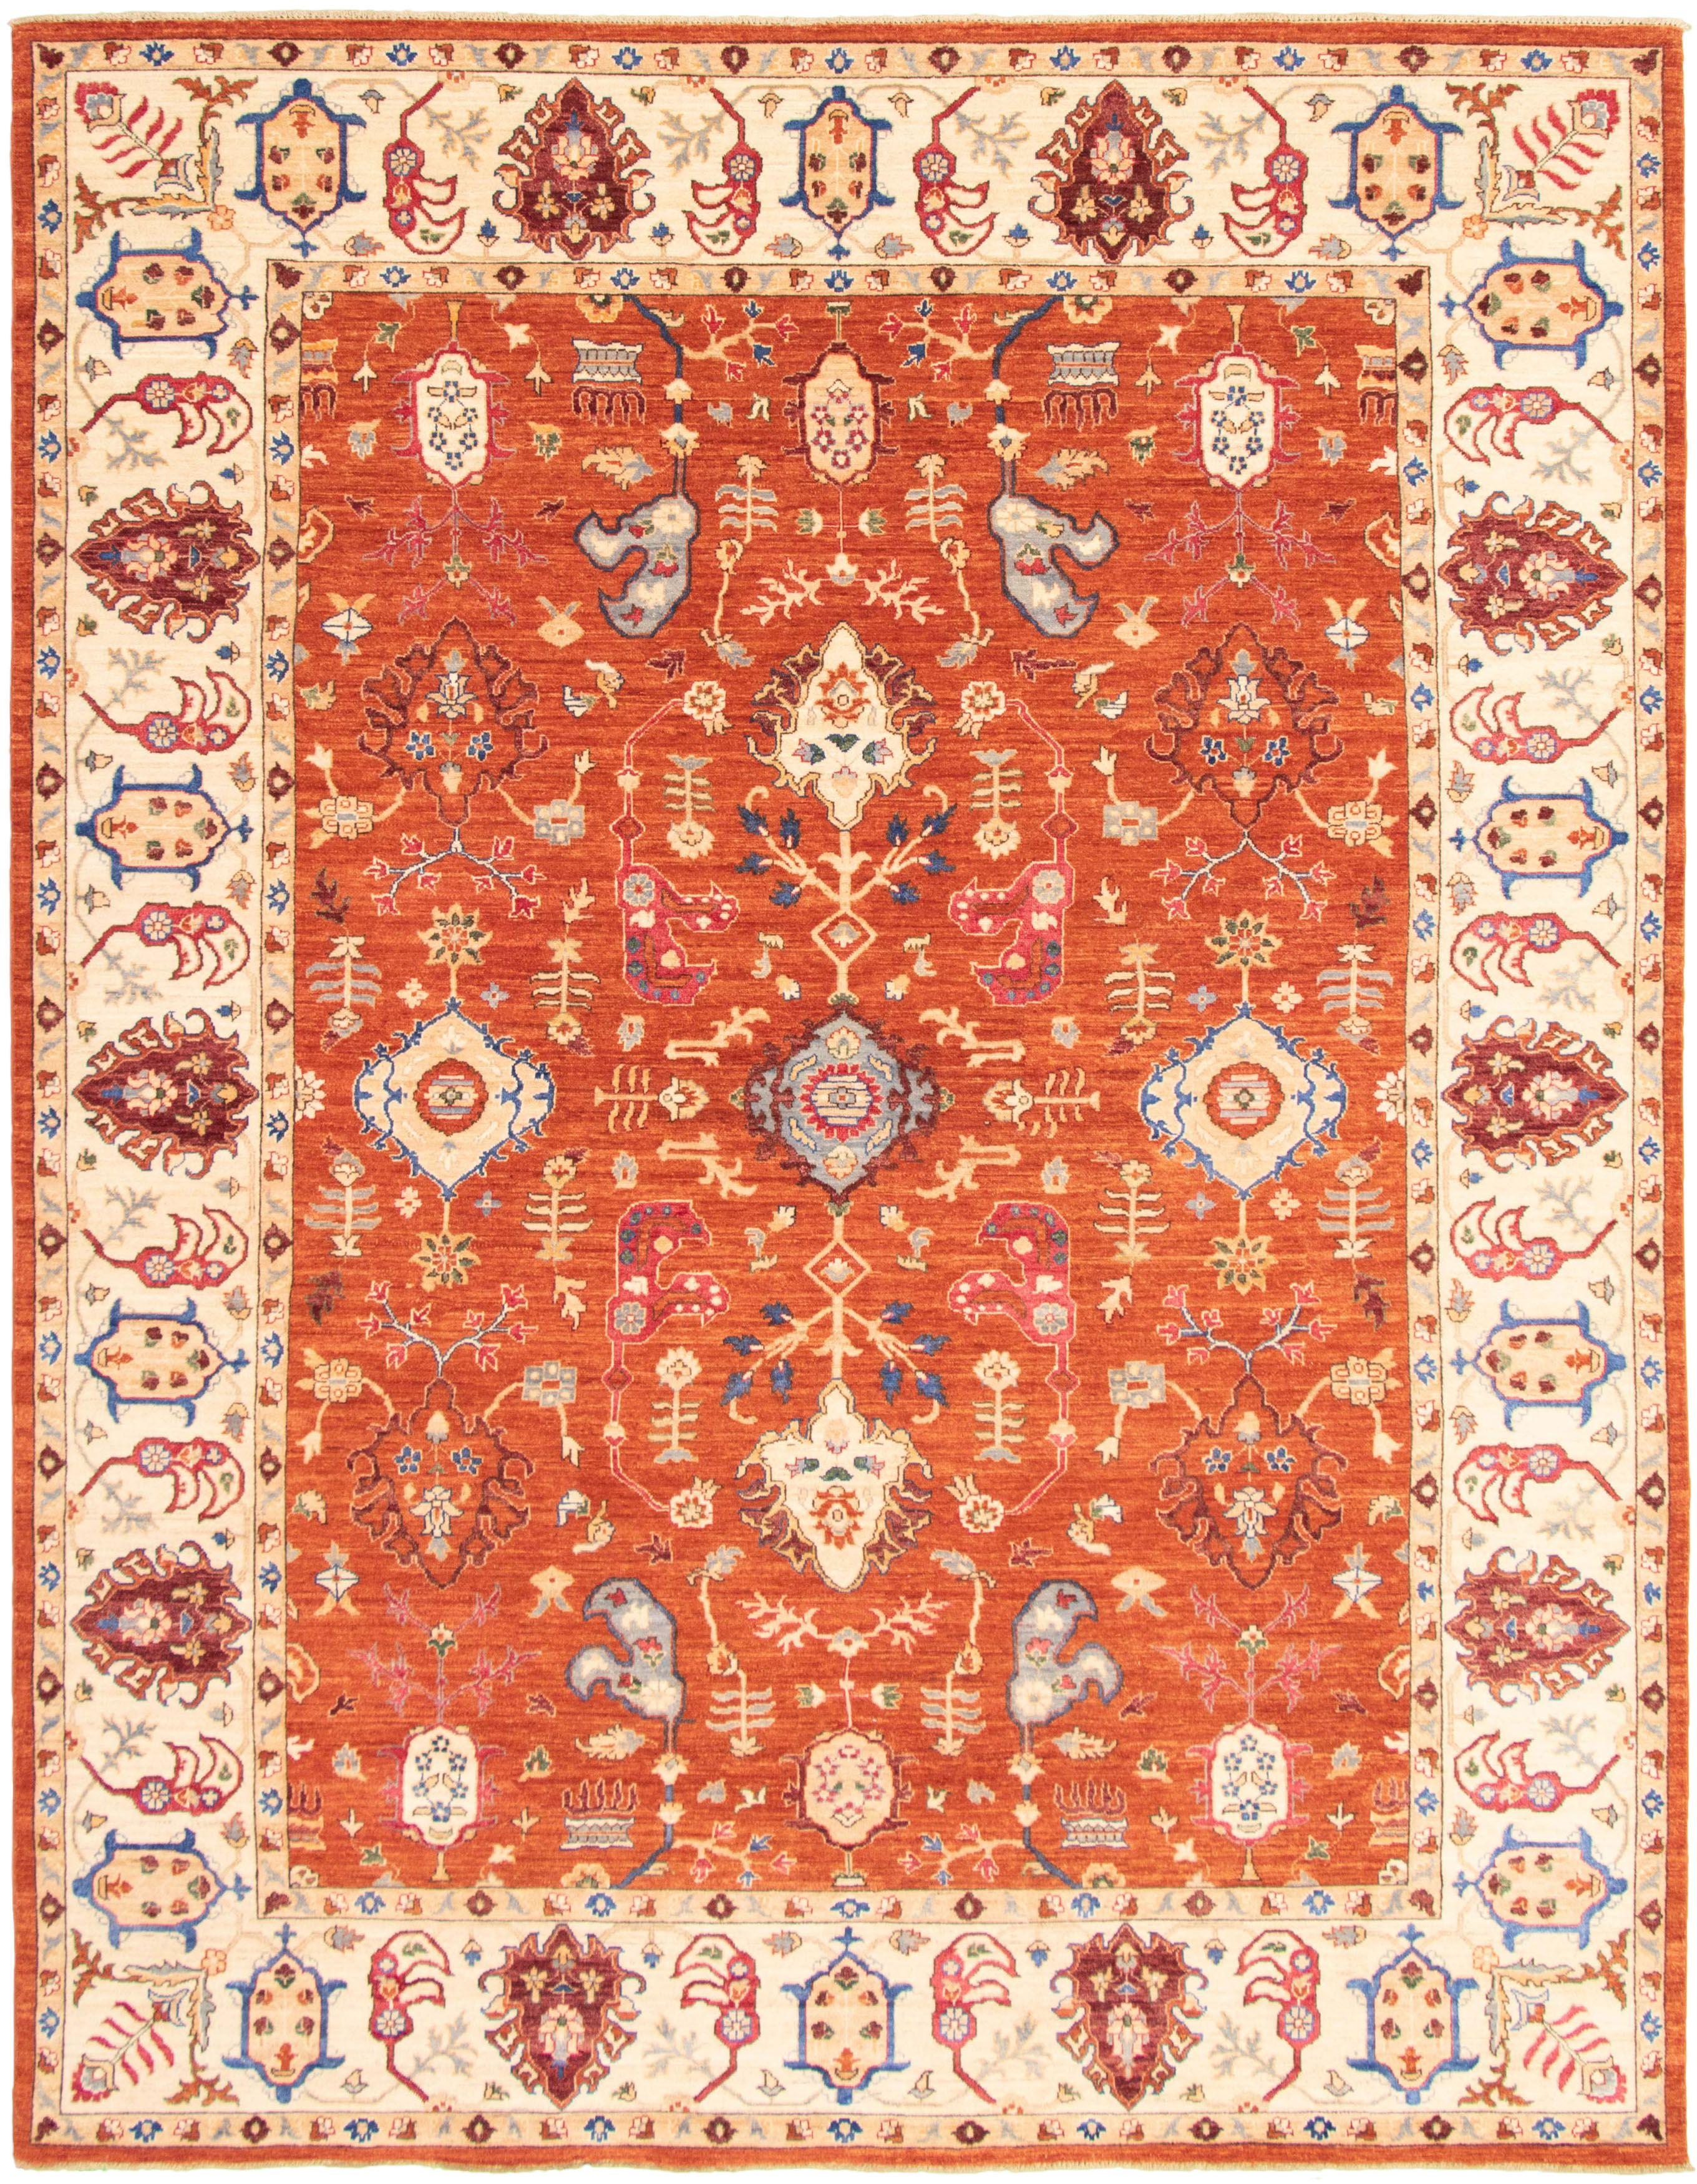 Pakistani Pako Persian 18 20 9 1 X 11 8 Hand Knotted Silk Wool Orange Rug Ecarpetgallery